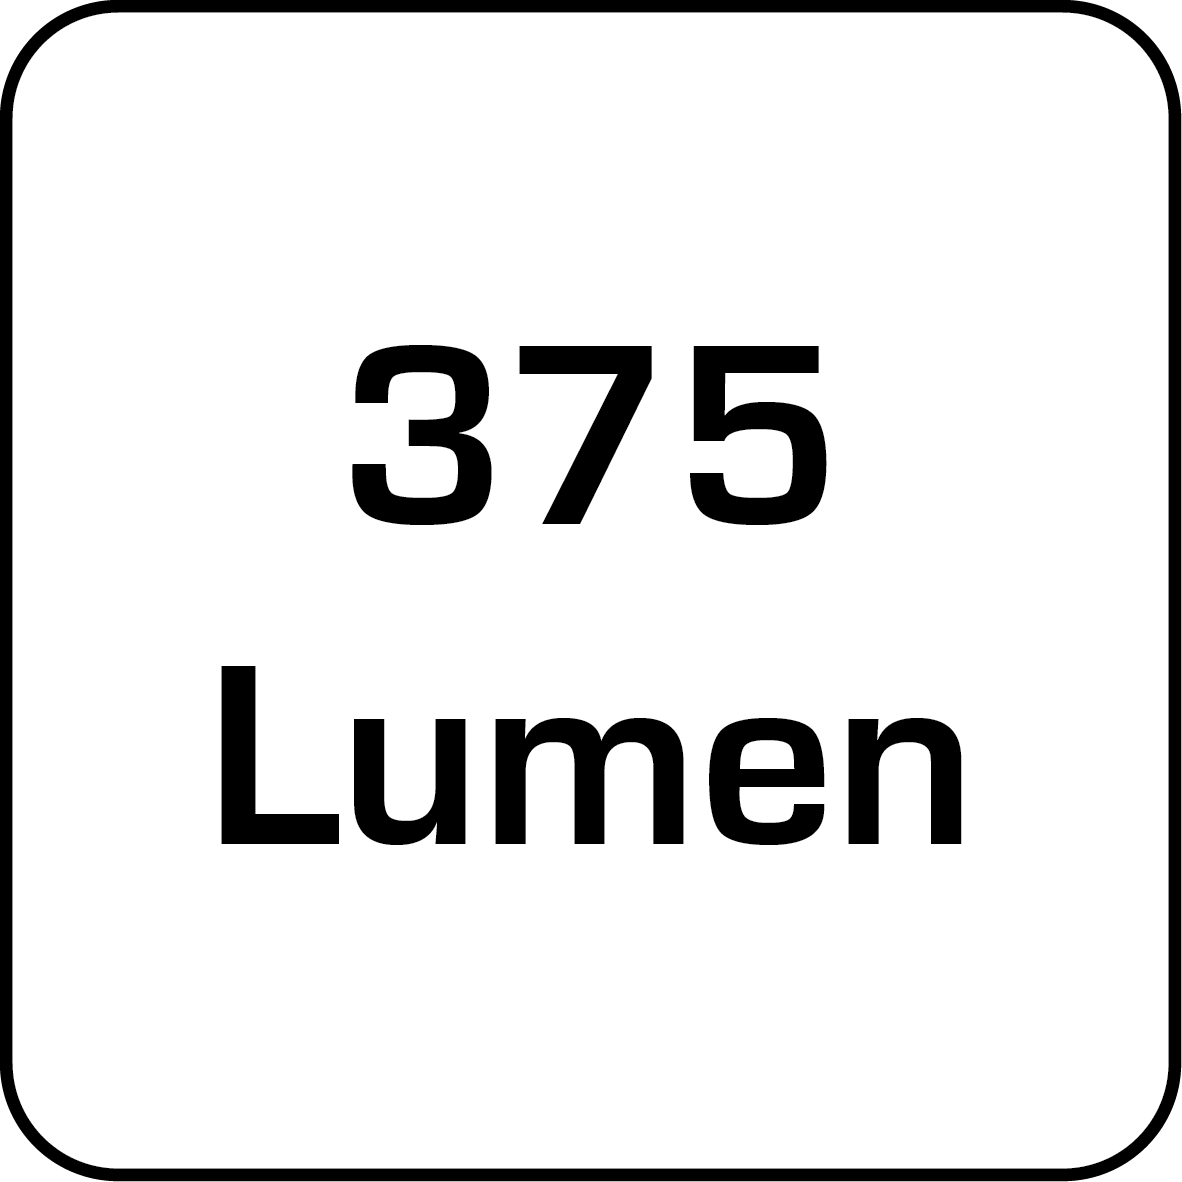 11-375-lumen